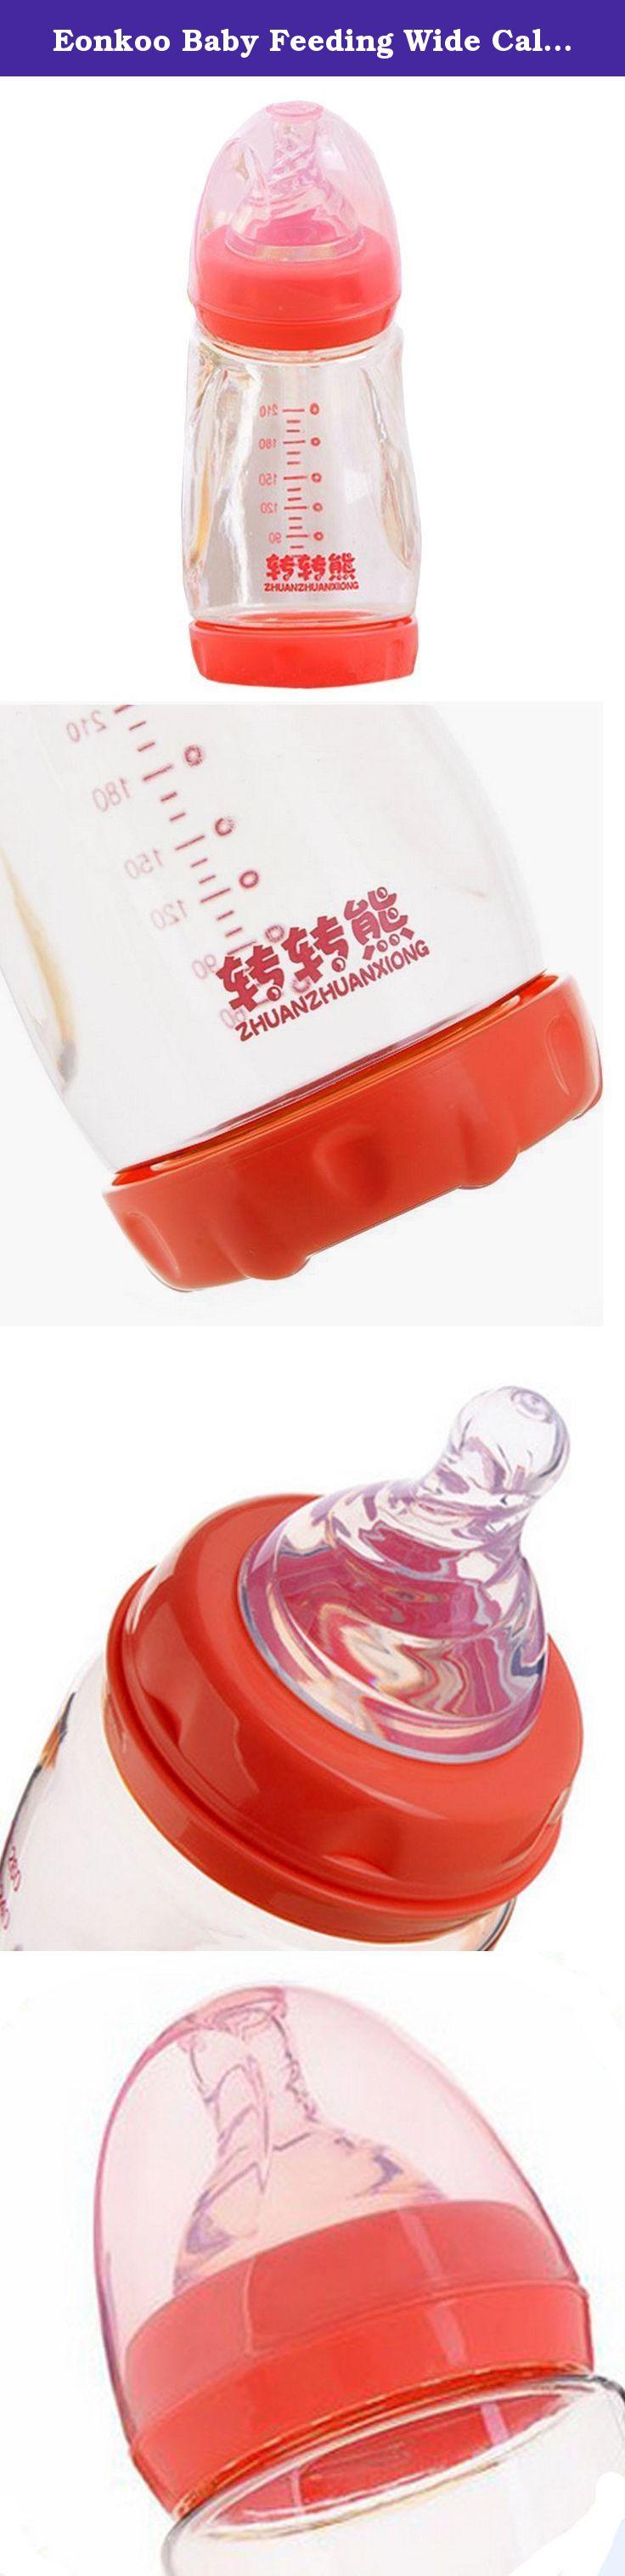 Eonkoo baby feeding wide caliber bottles crashproof1